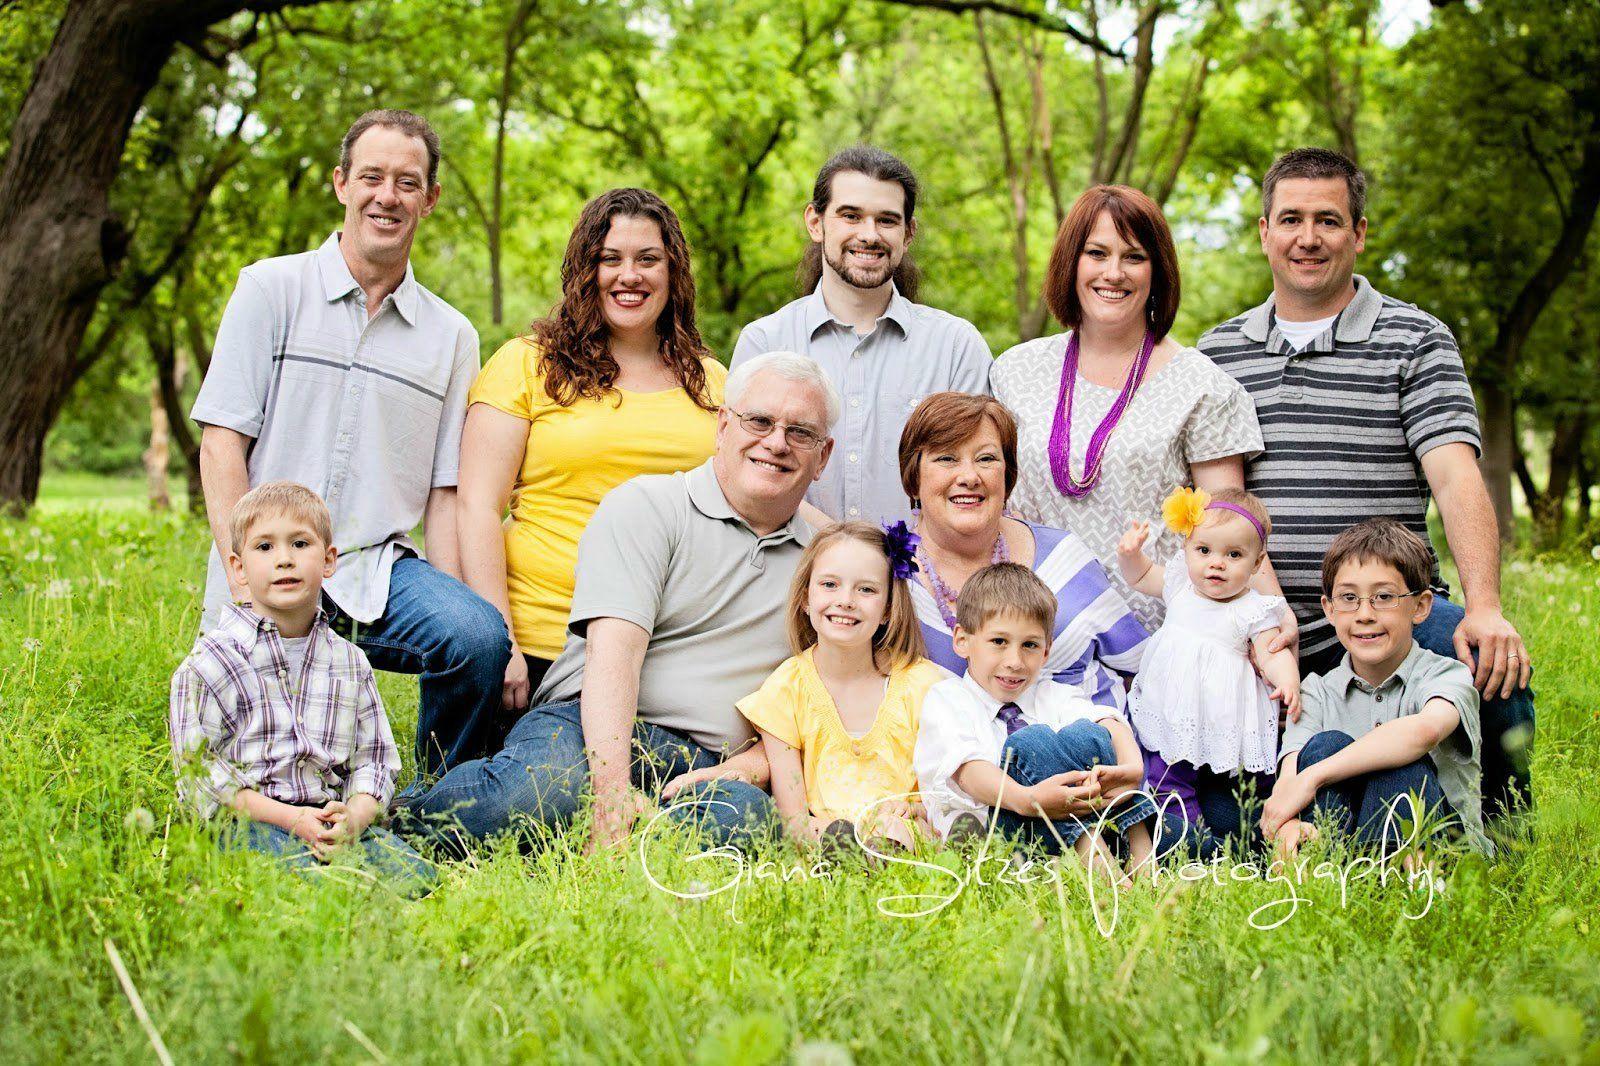 suclichfinal-13-happy-family